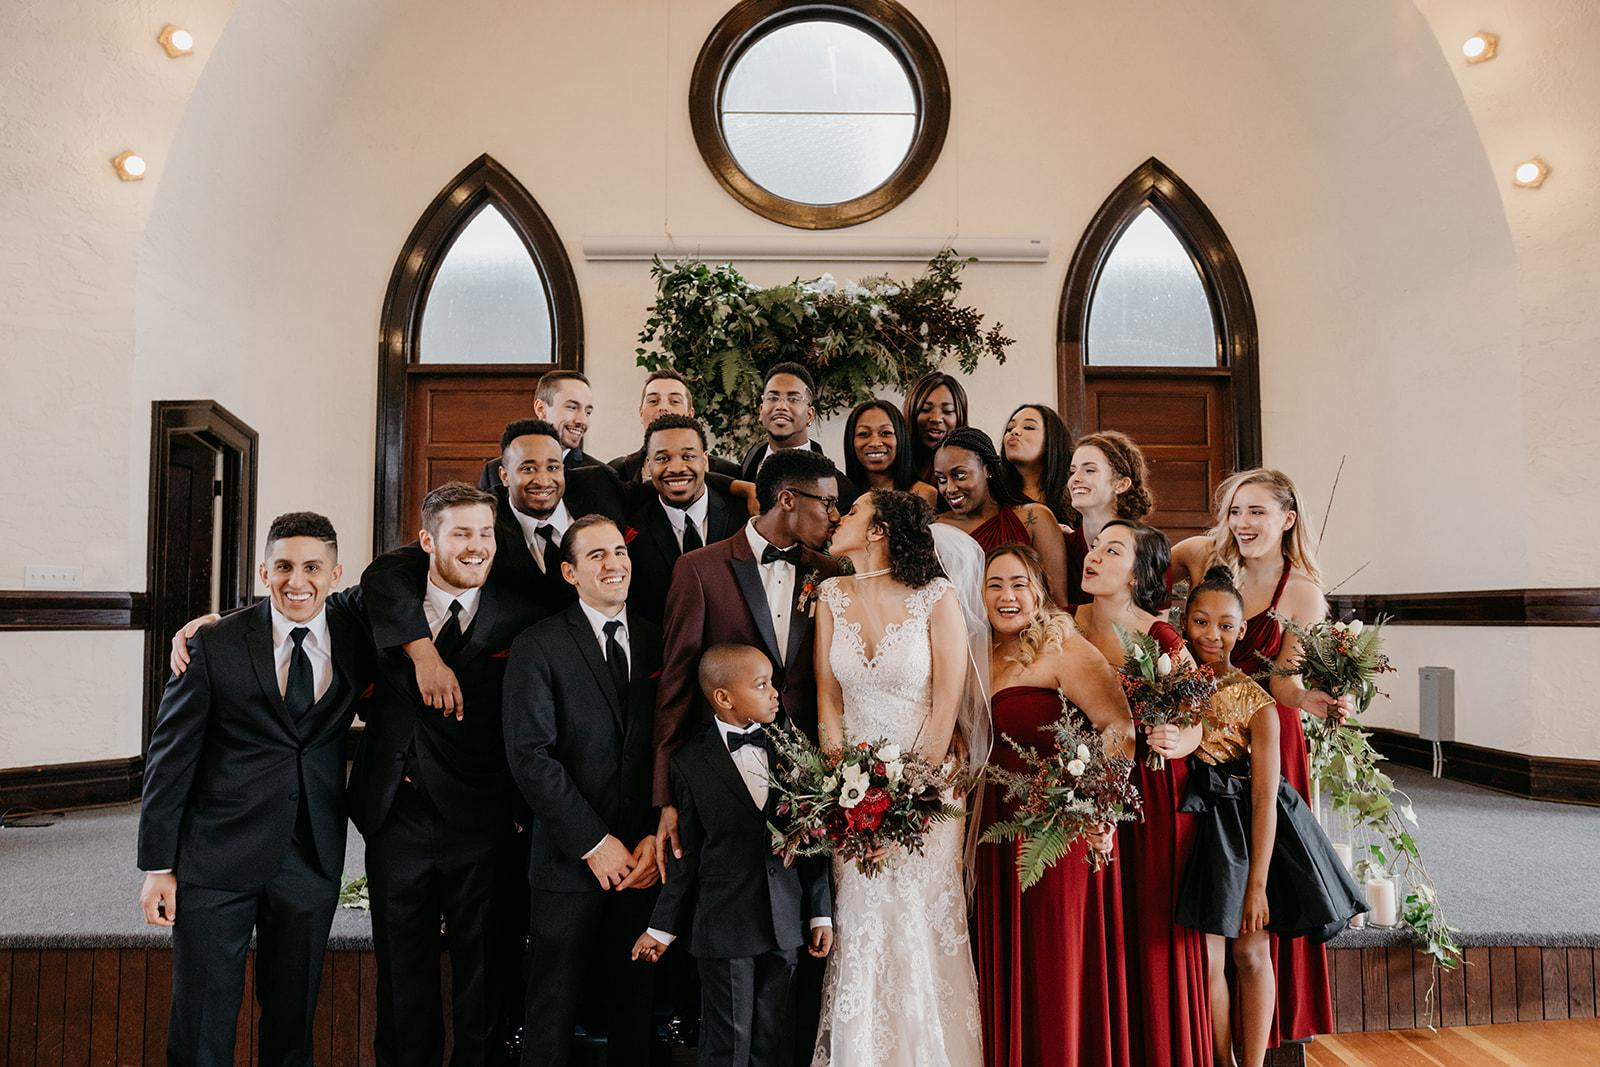 portland - wedding - photographer - doorofhopechurch361.jpg